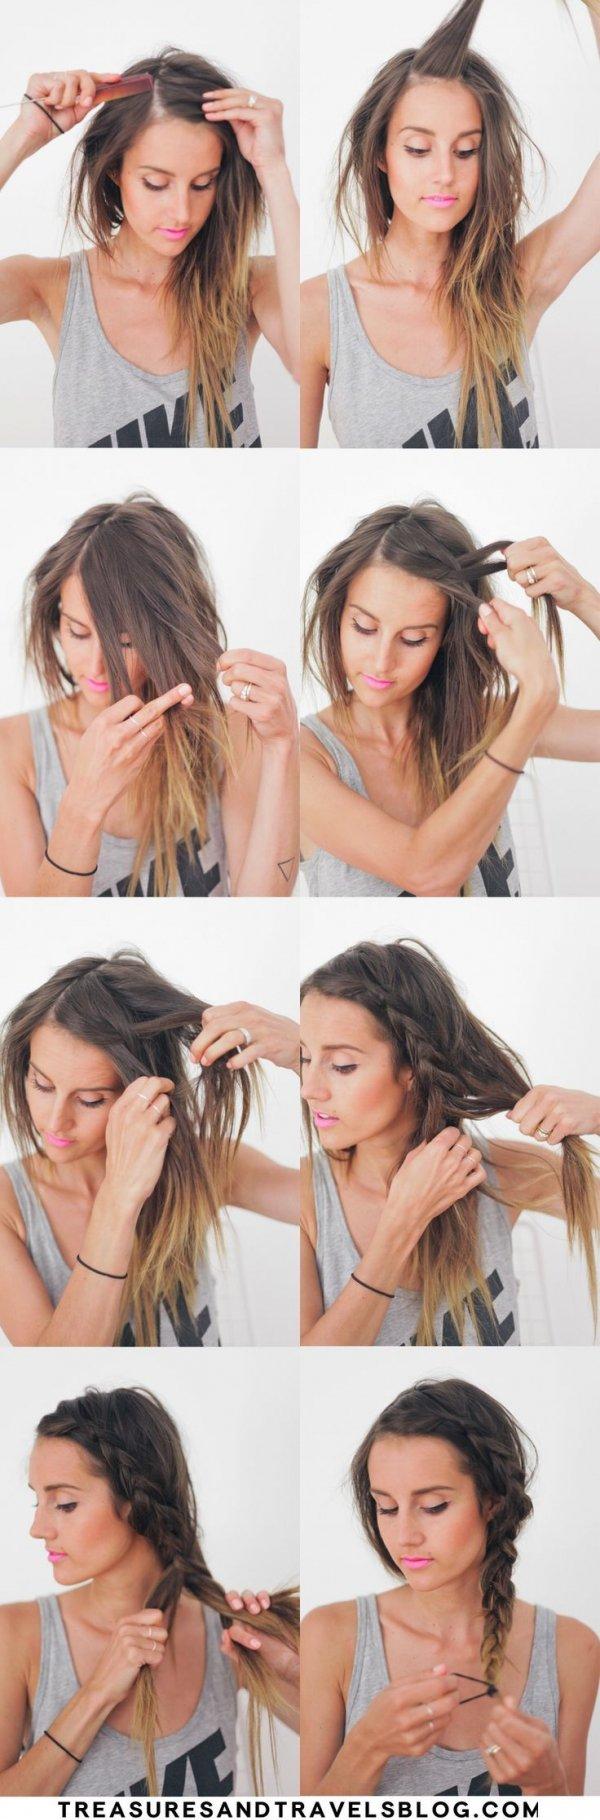 hair,face,hairstyle,nose,long hair,